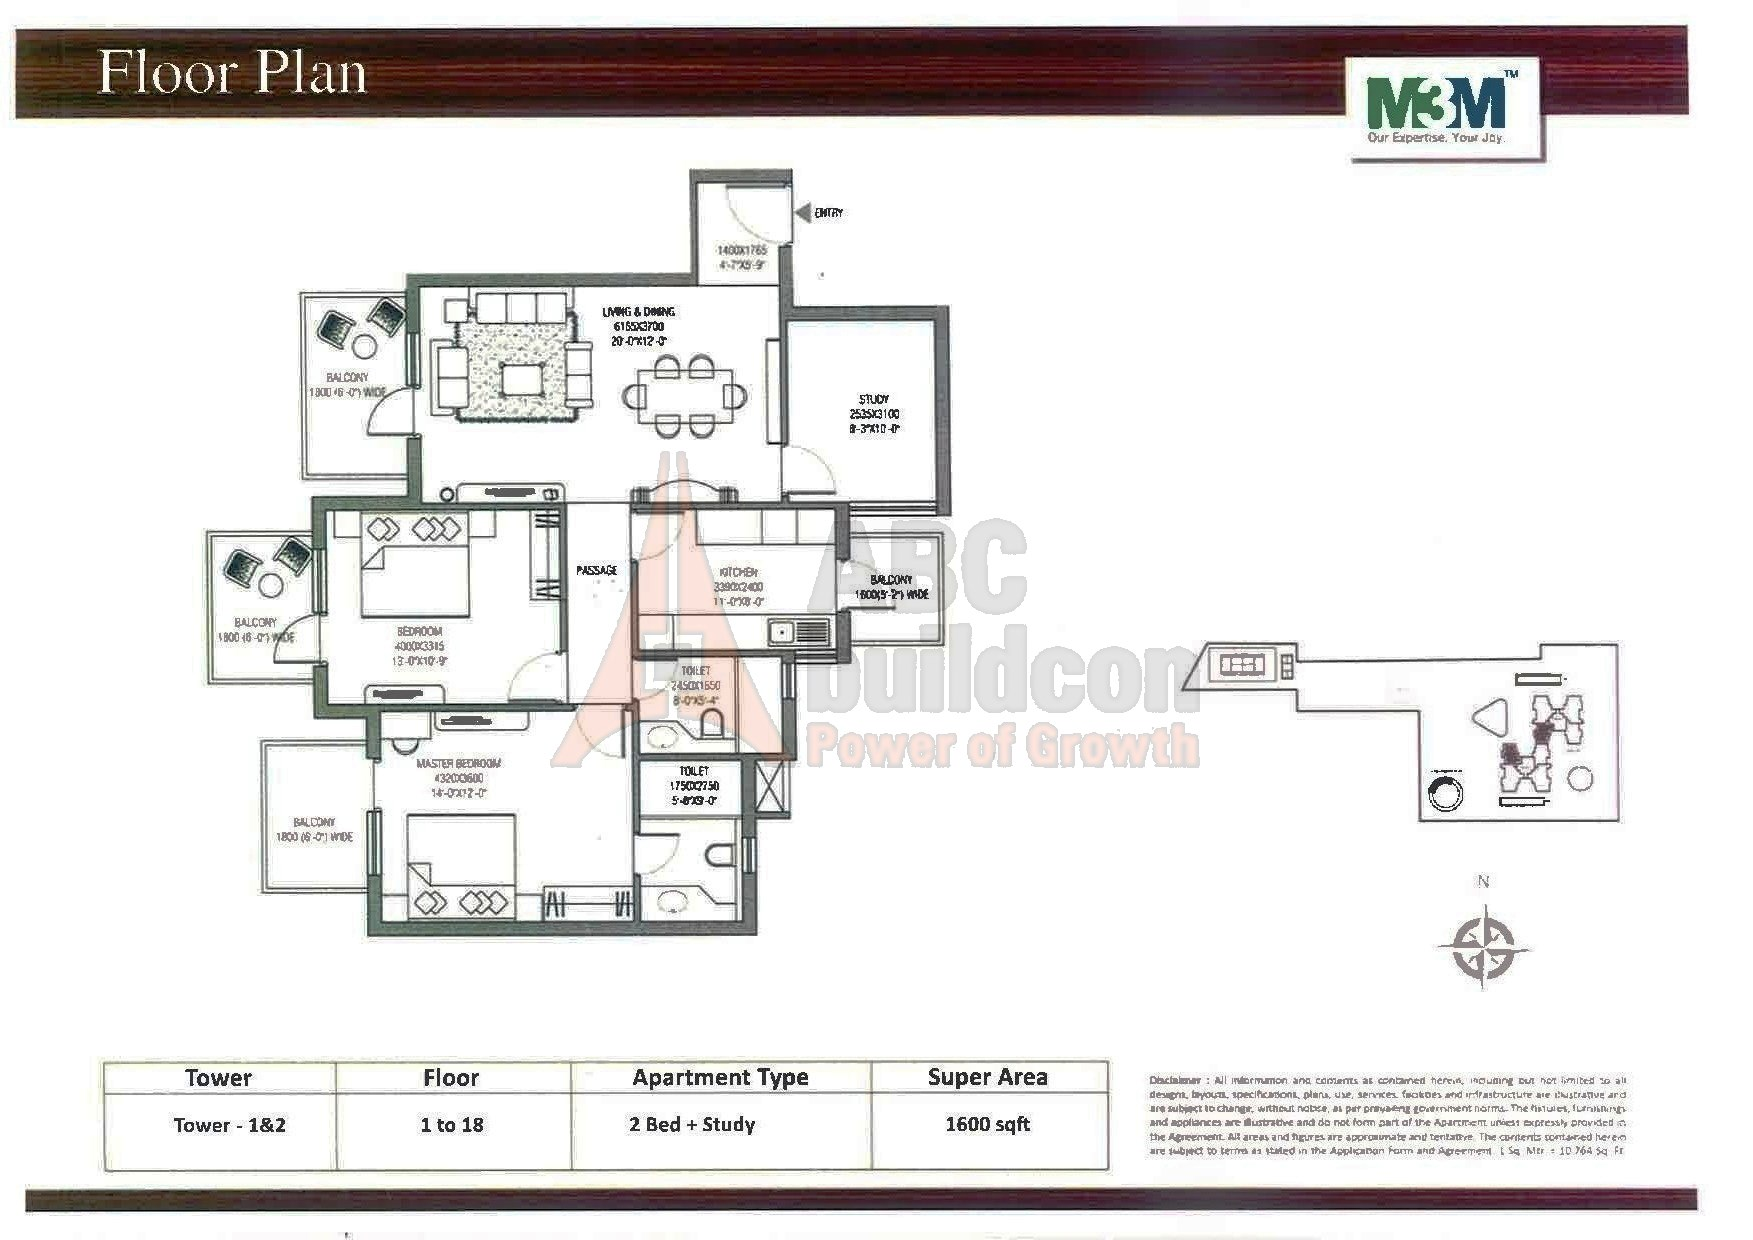 M3m Escala Floor Plan Floorplan In